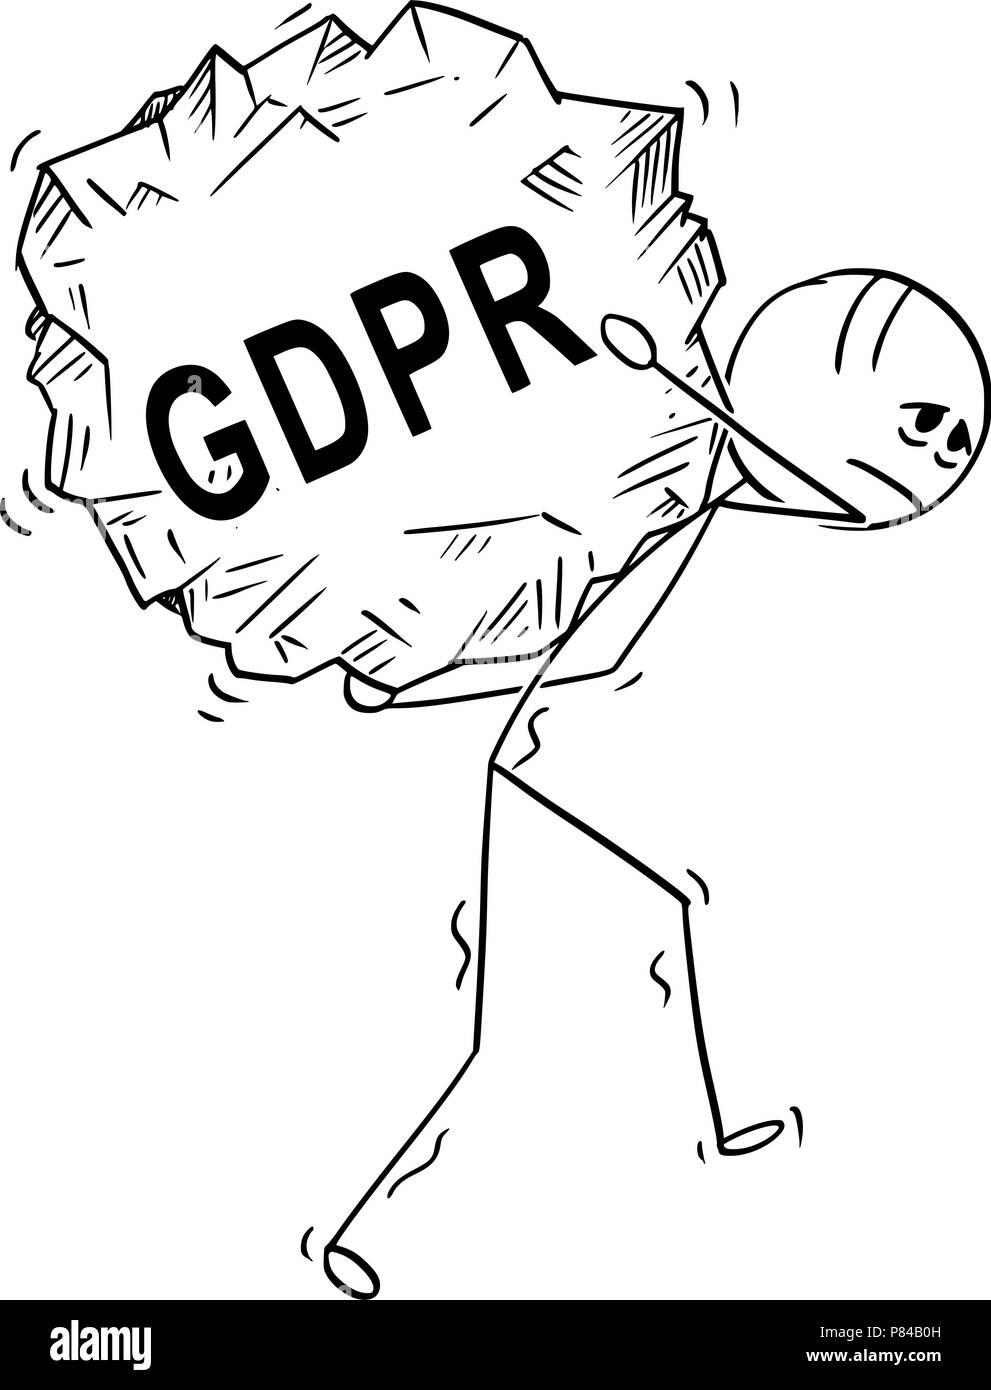 Cartoon of Man Carrying Big Piece of Rock With Text GDPR - Stock Image